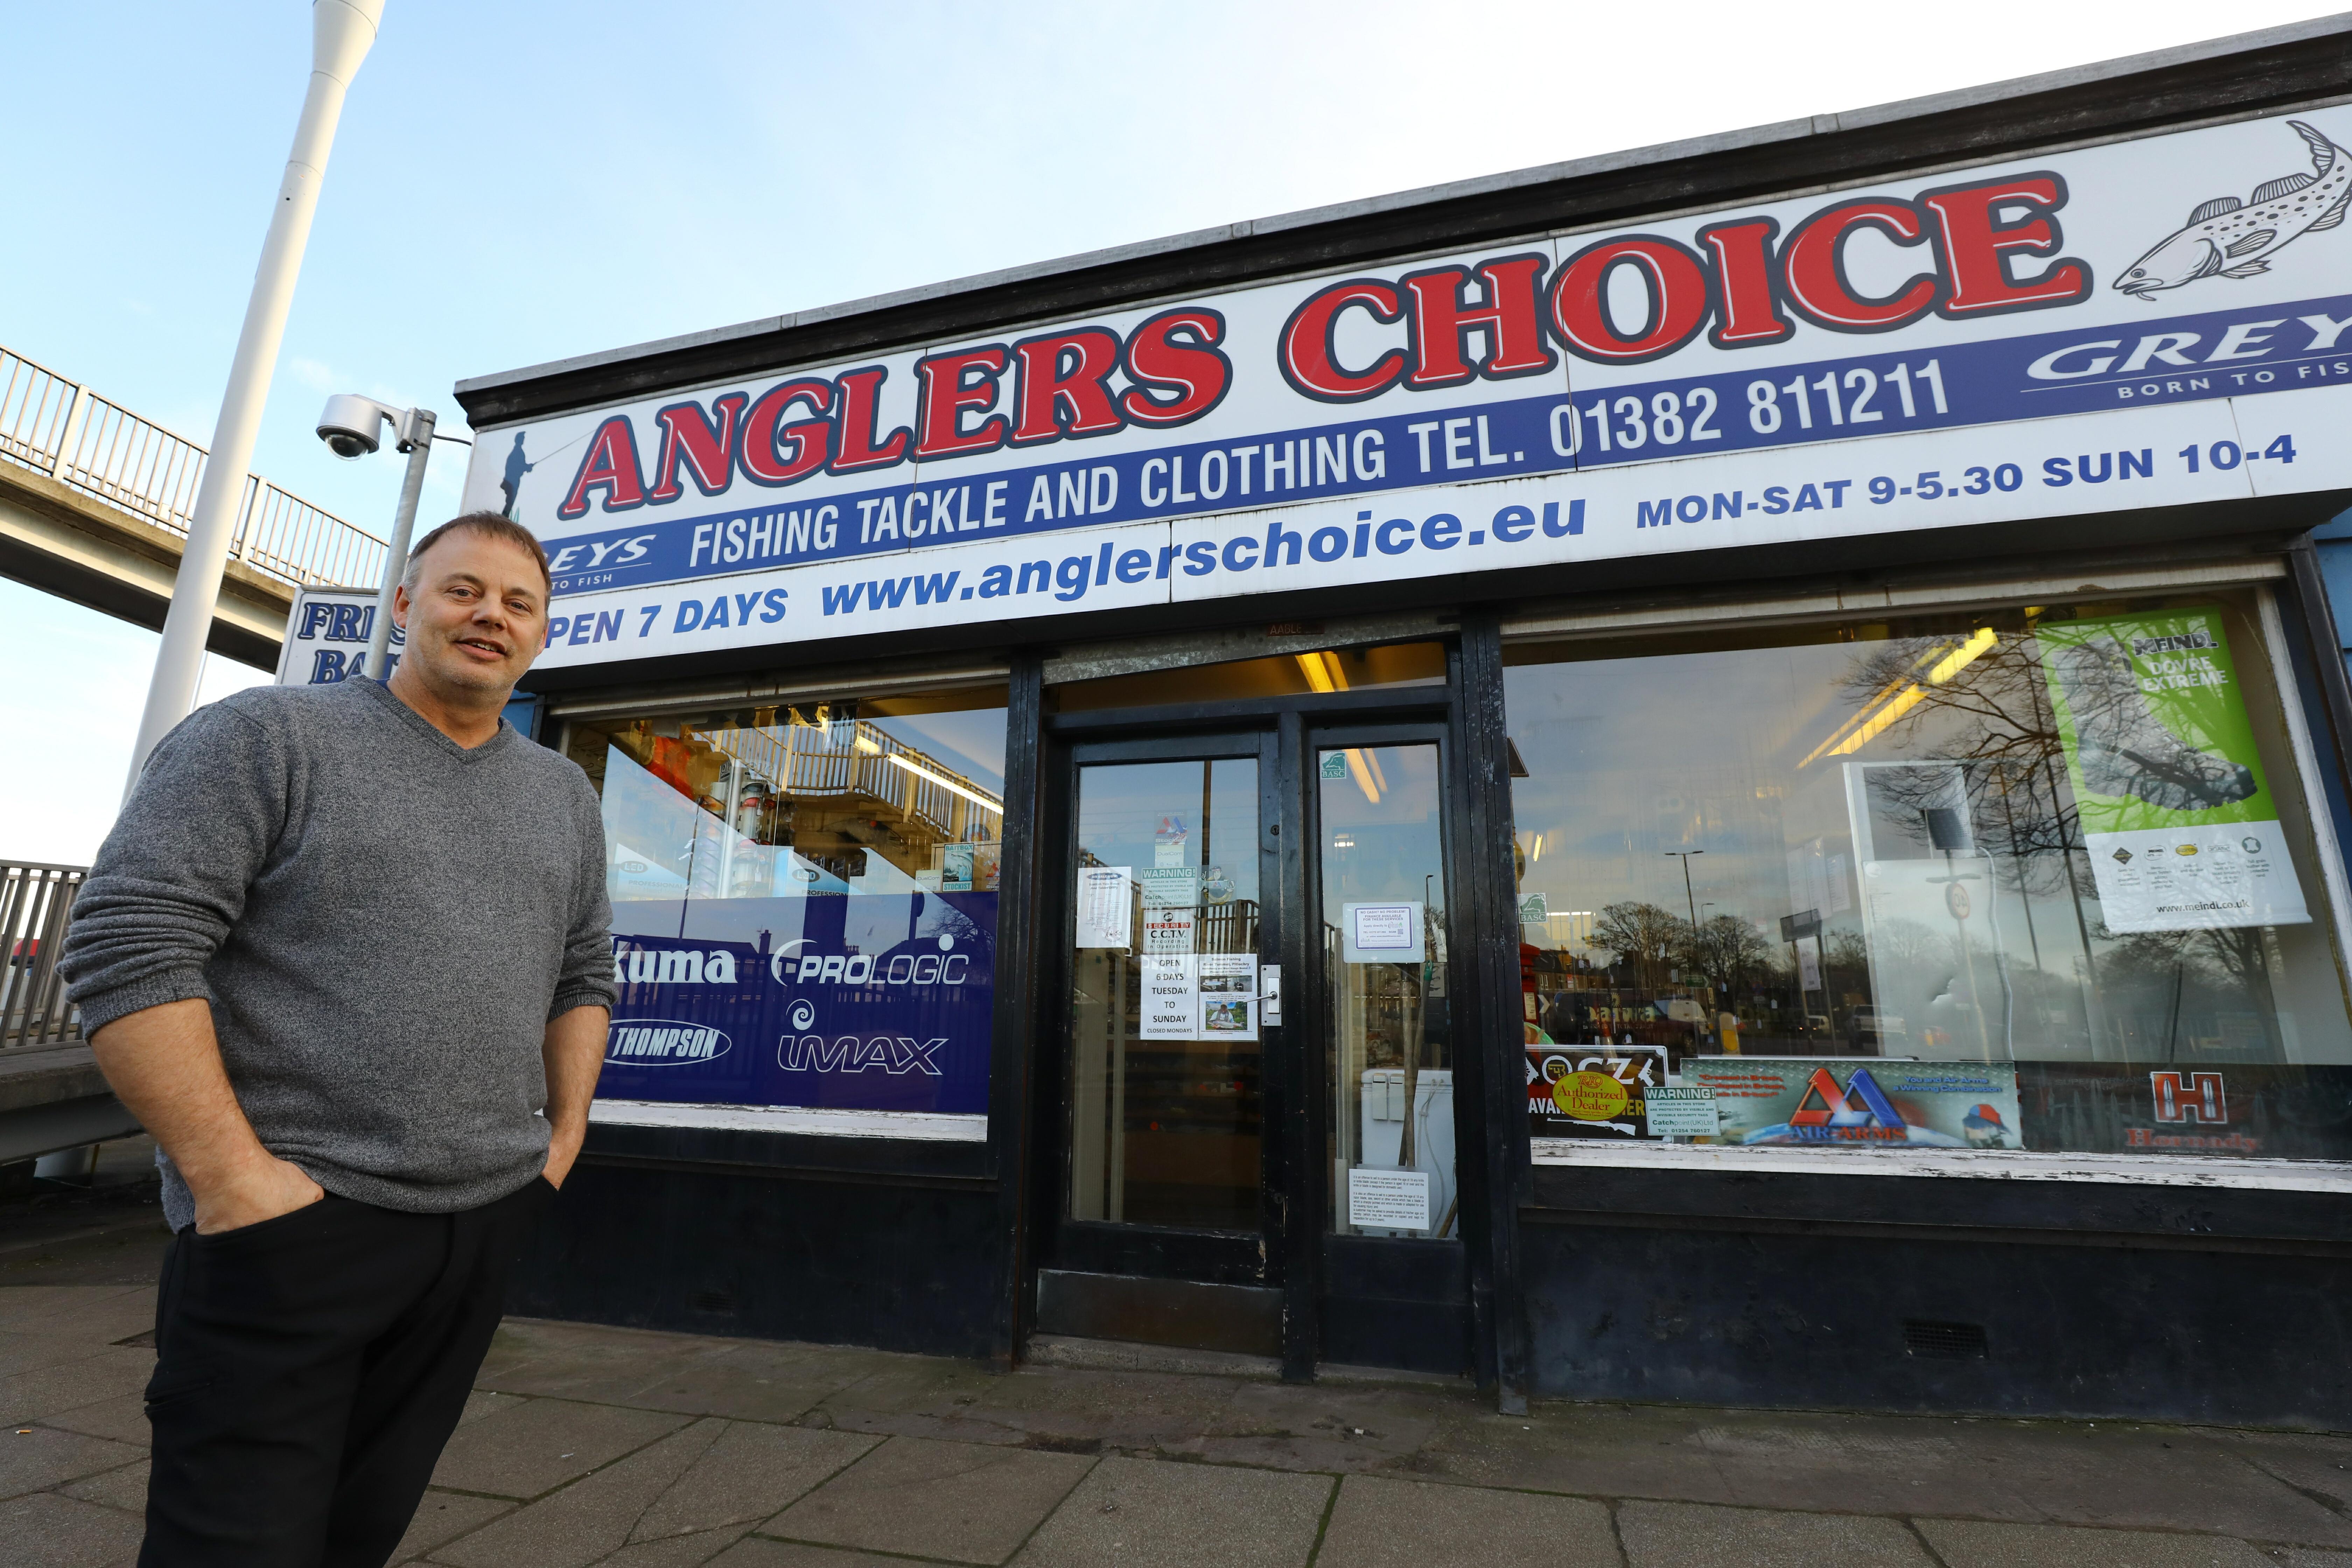 Robbie MacGregor, owner of Angler's Choice on Strathmartine Road